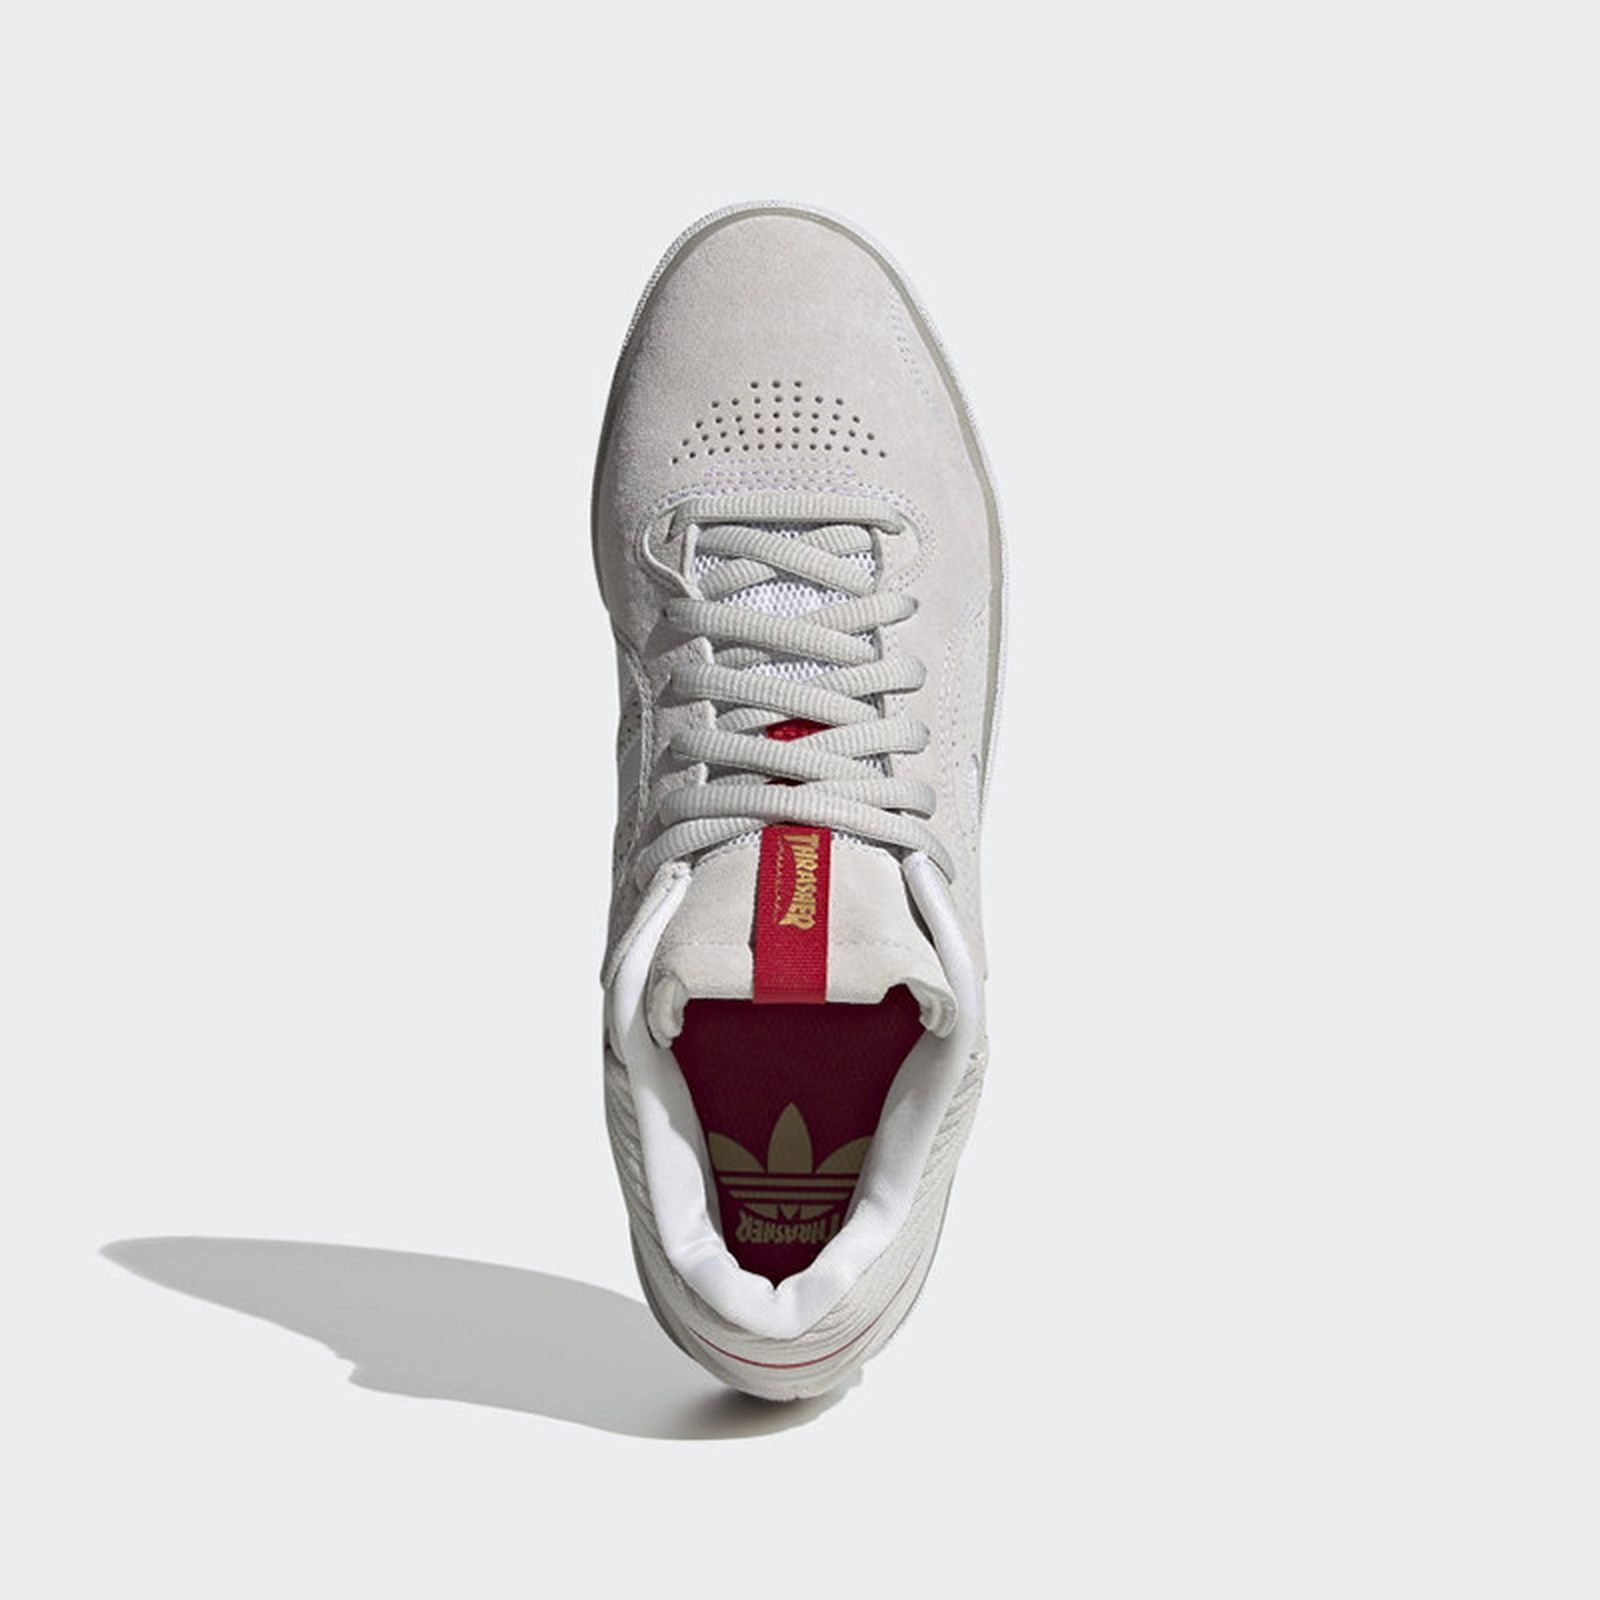 thrasher-adidas-superstar-adv-tyshawn-jones-release-date-price-1-09